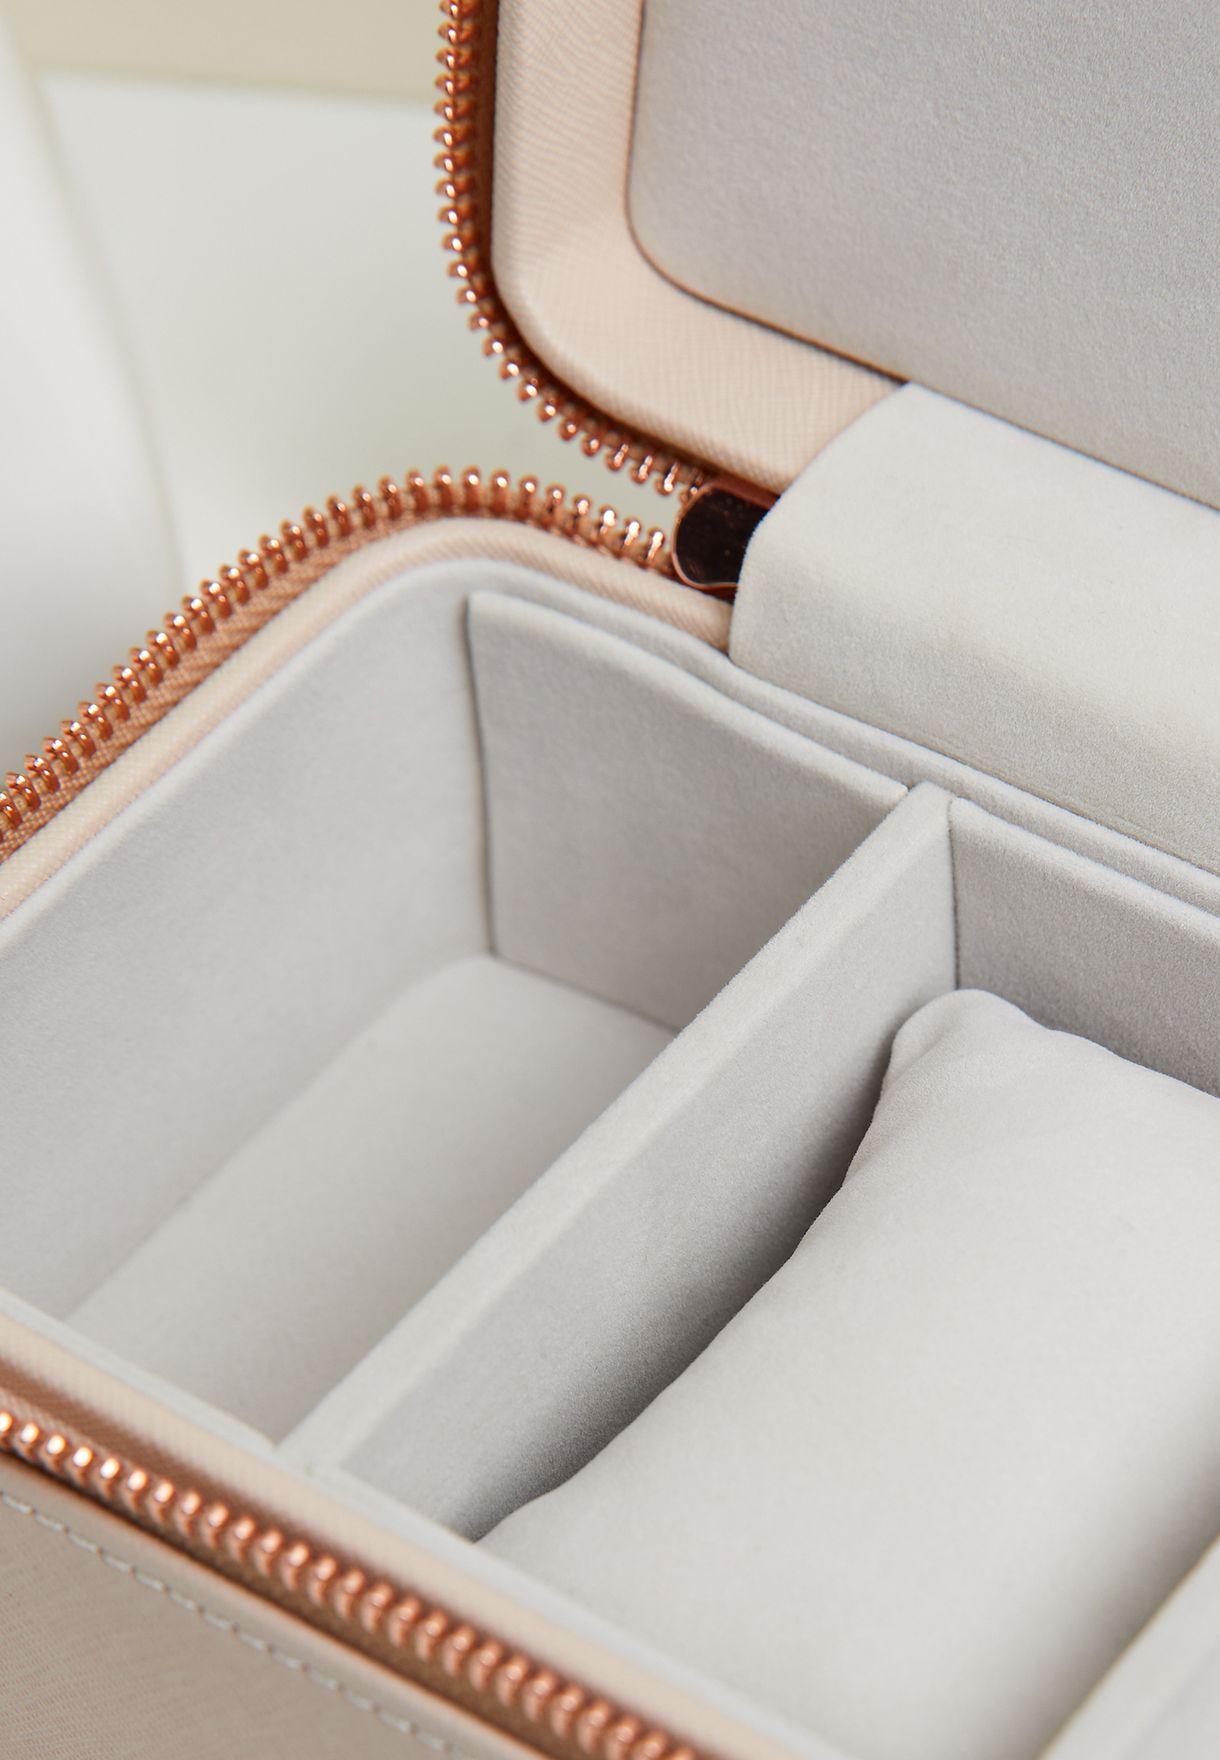 صندوق مجوهرات وساعة